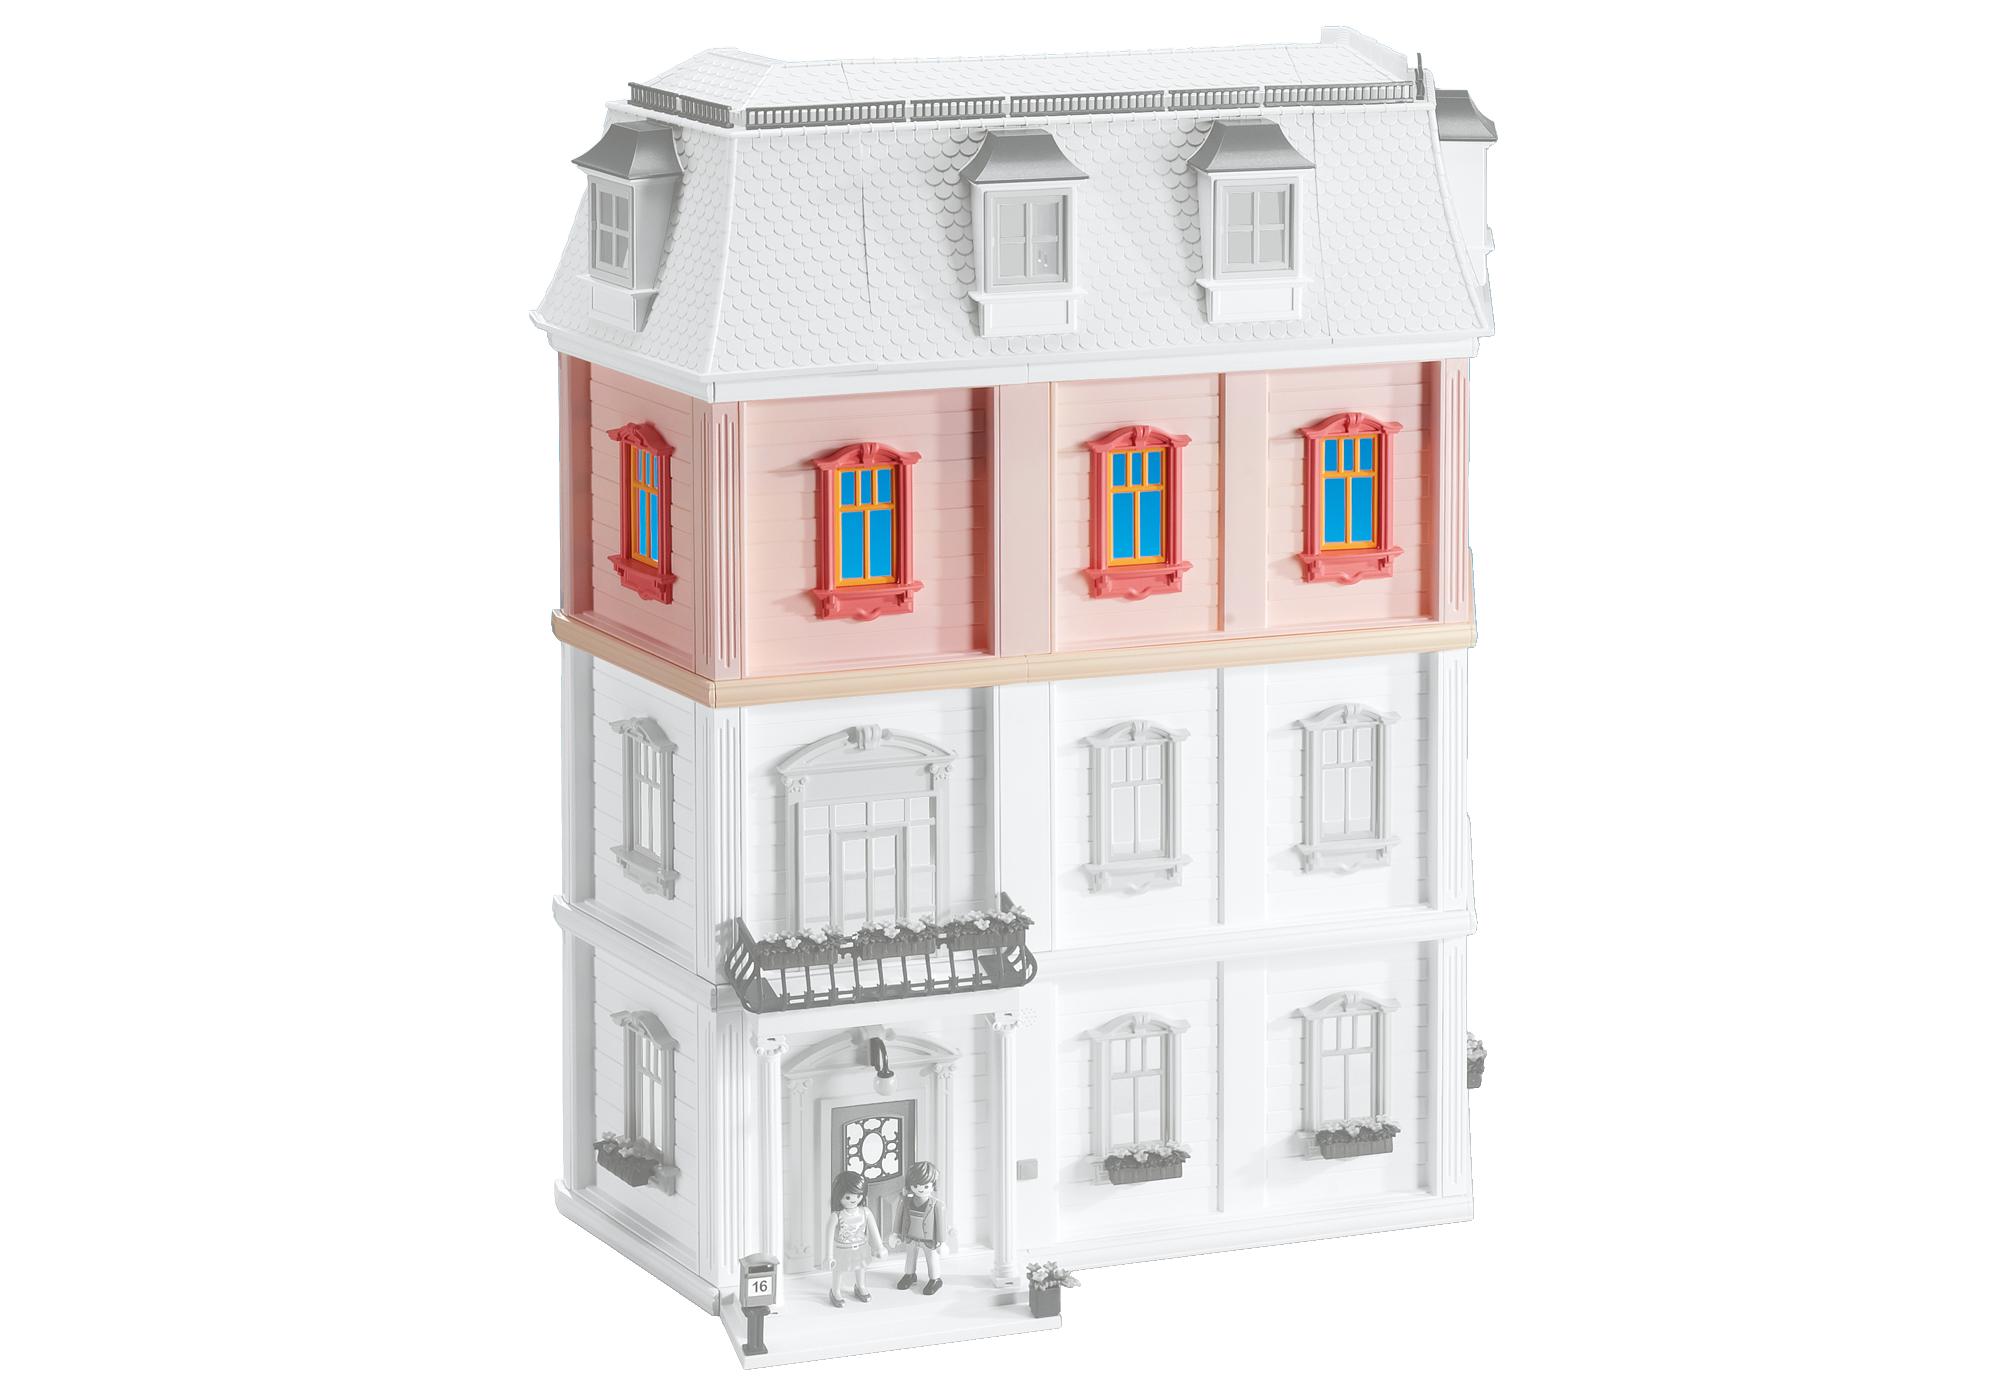 http://media.playmobil.com/i/playmobil/6453_product_detail/Corner Floor Extension for Deluxe Dollhouse (5303)